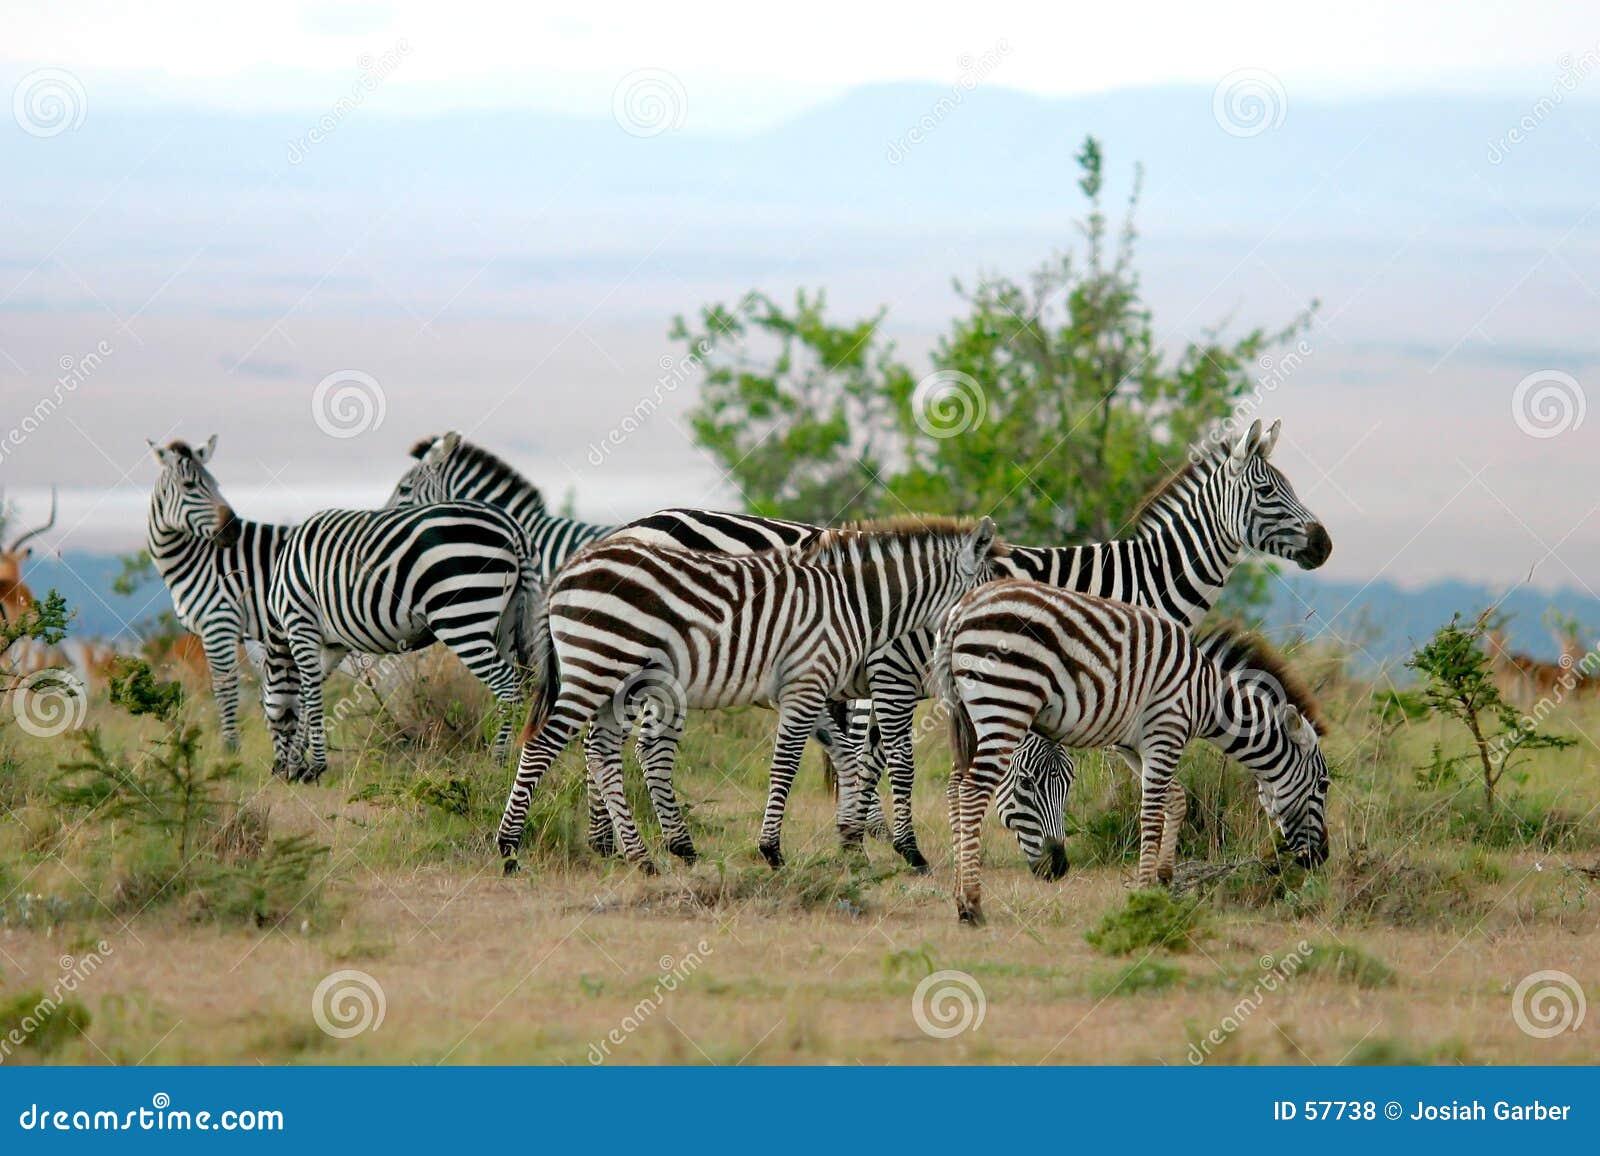 Zebre in Africa